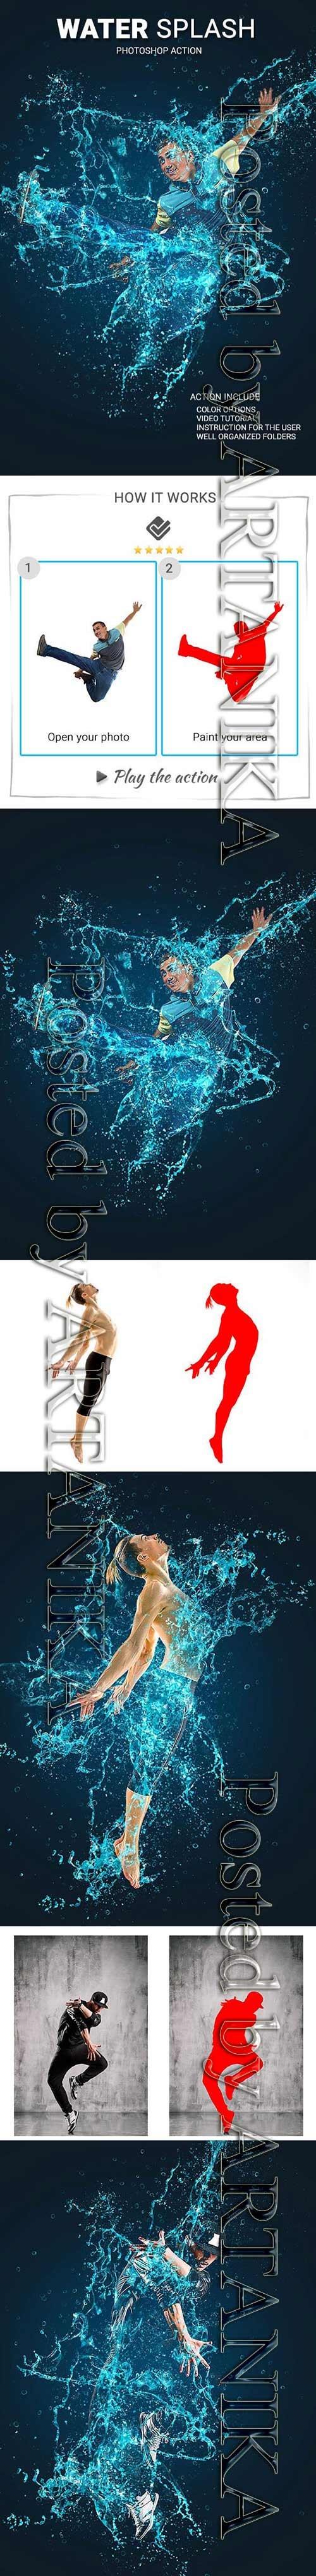 GraphicRiver - Water Splash Photoshop Action 21742371